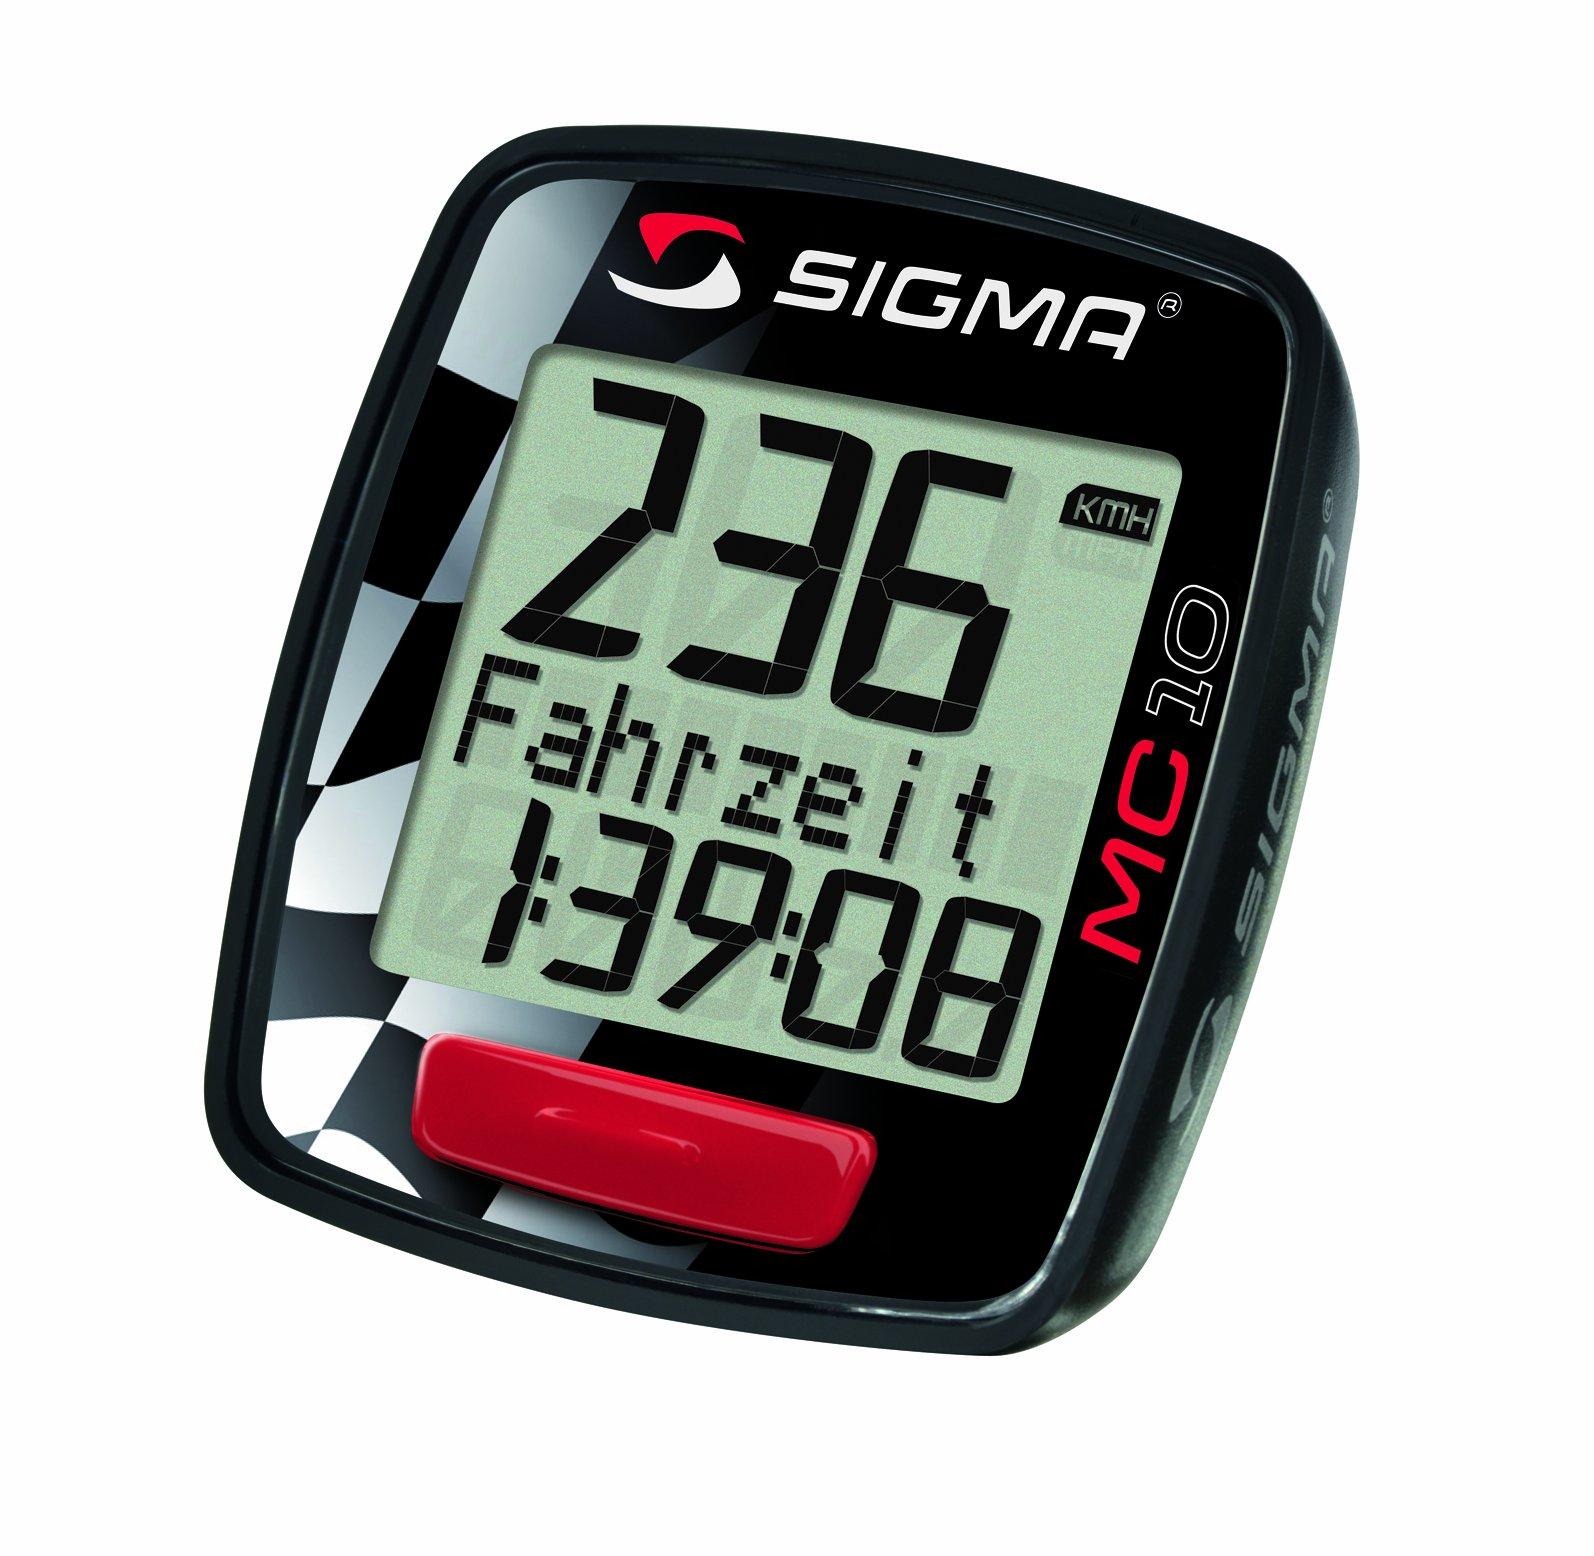 Sigma Sport Motorrad Computer MC 10 - Pulsómetro product image